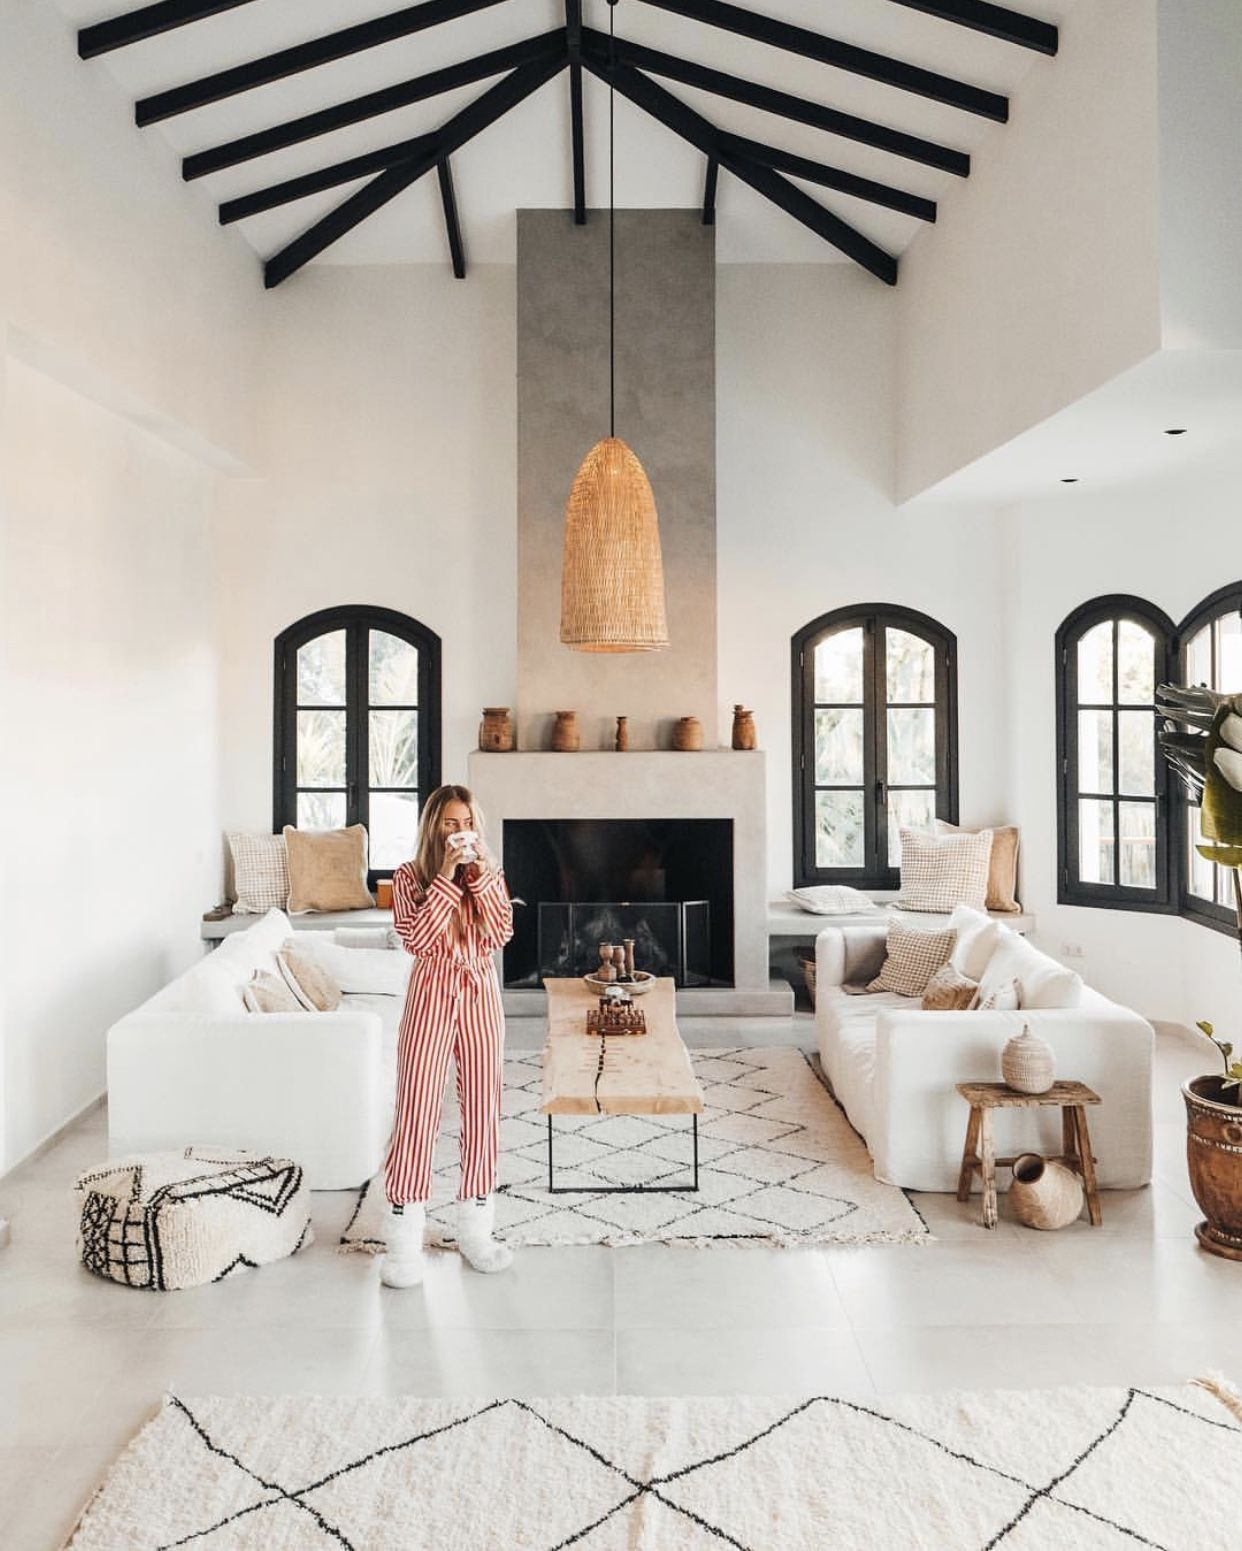 Pin By Melissa Hawkins On Homey Spanish Living Room Home House Design Living room in spanish